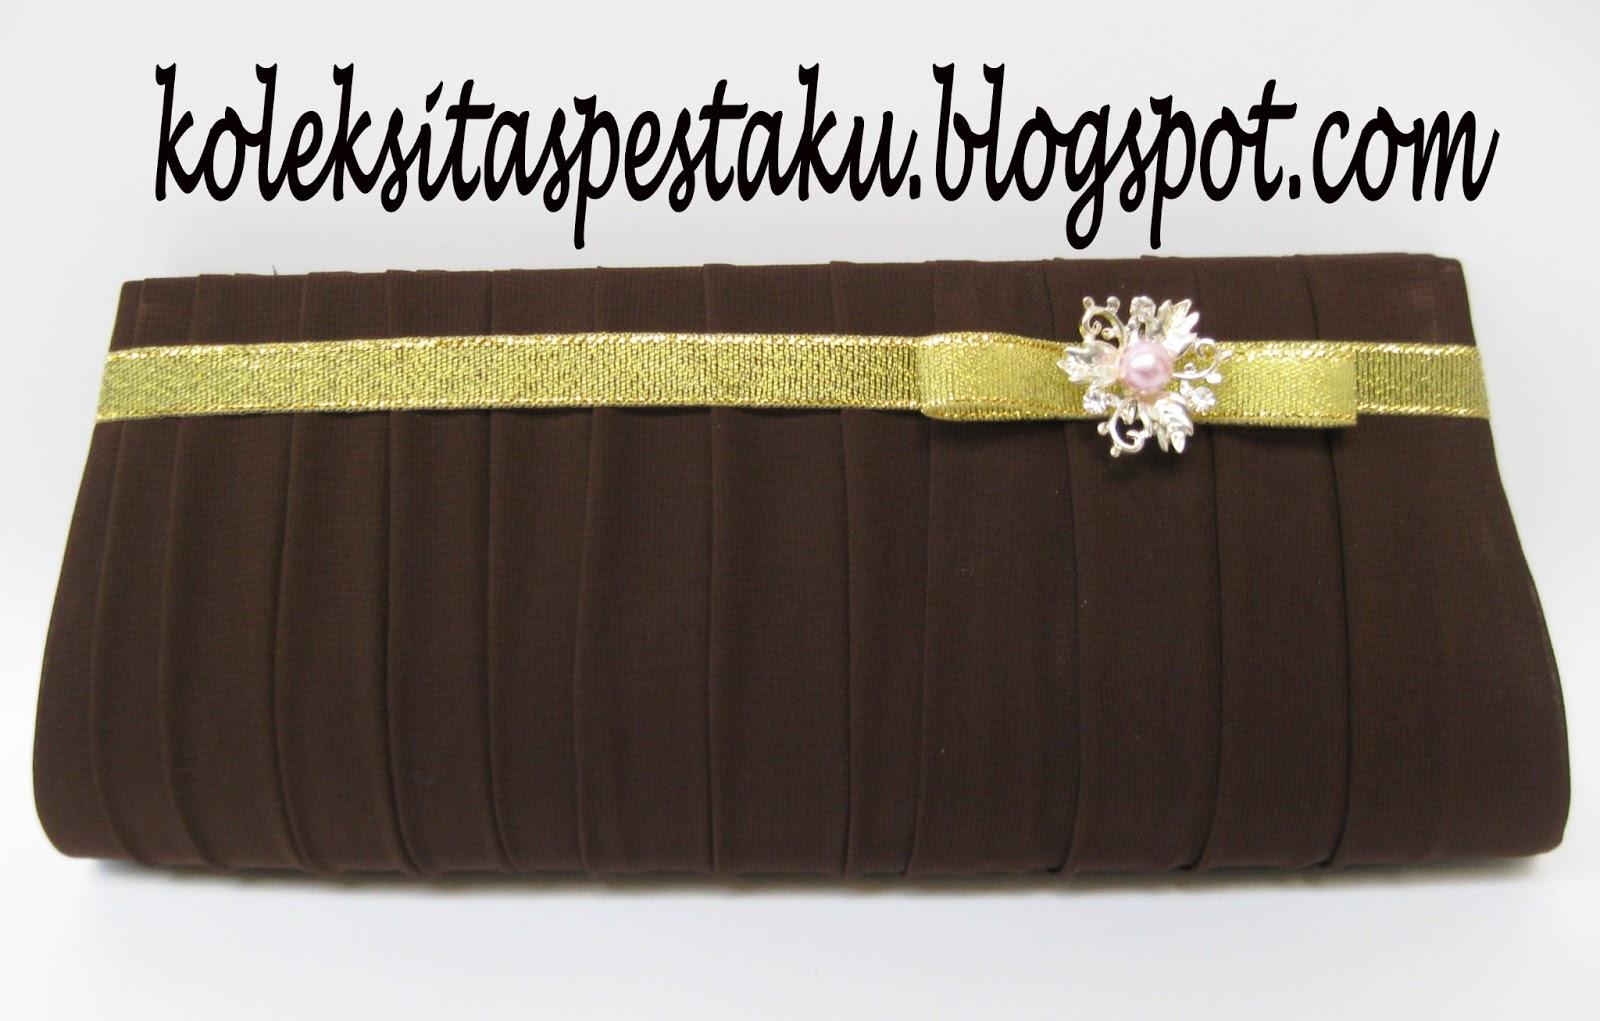 Tas Pesta - Clutch Bag  taspestaku  Tas Pesta - Clutch Bag Cantik ... 3a7398b1eb